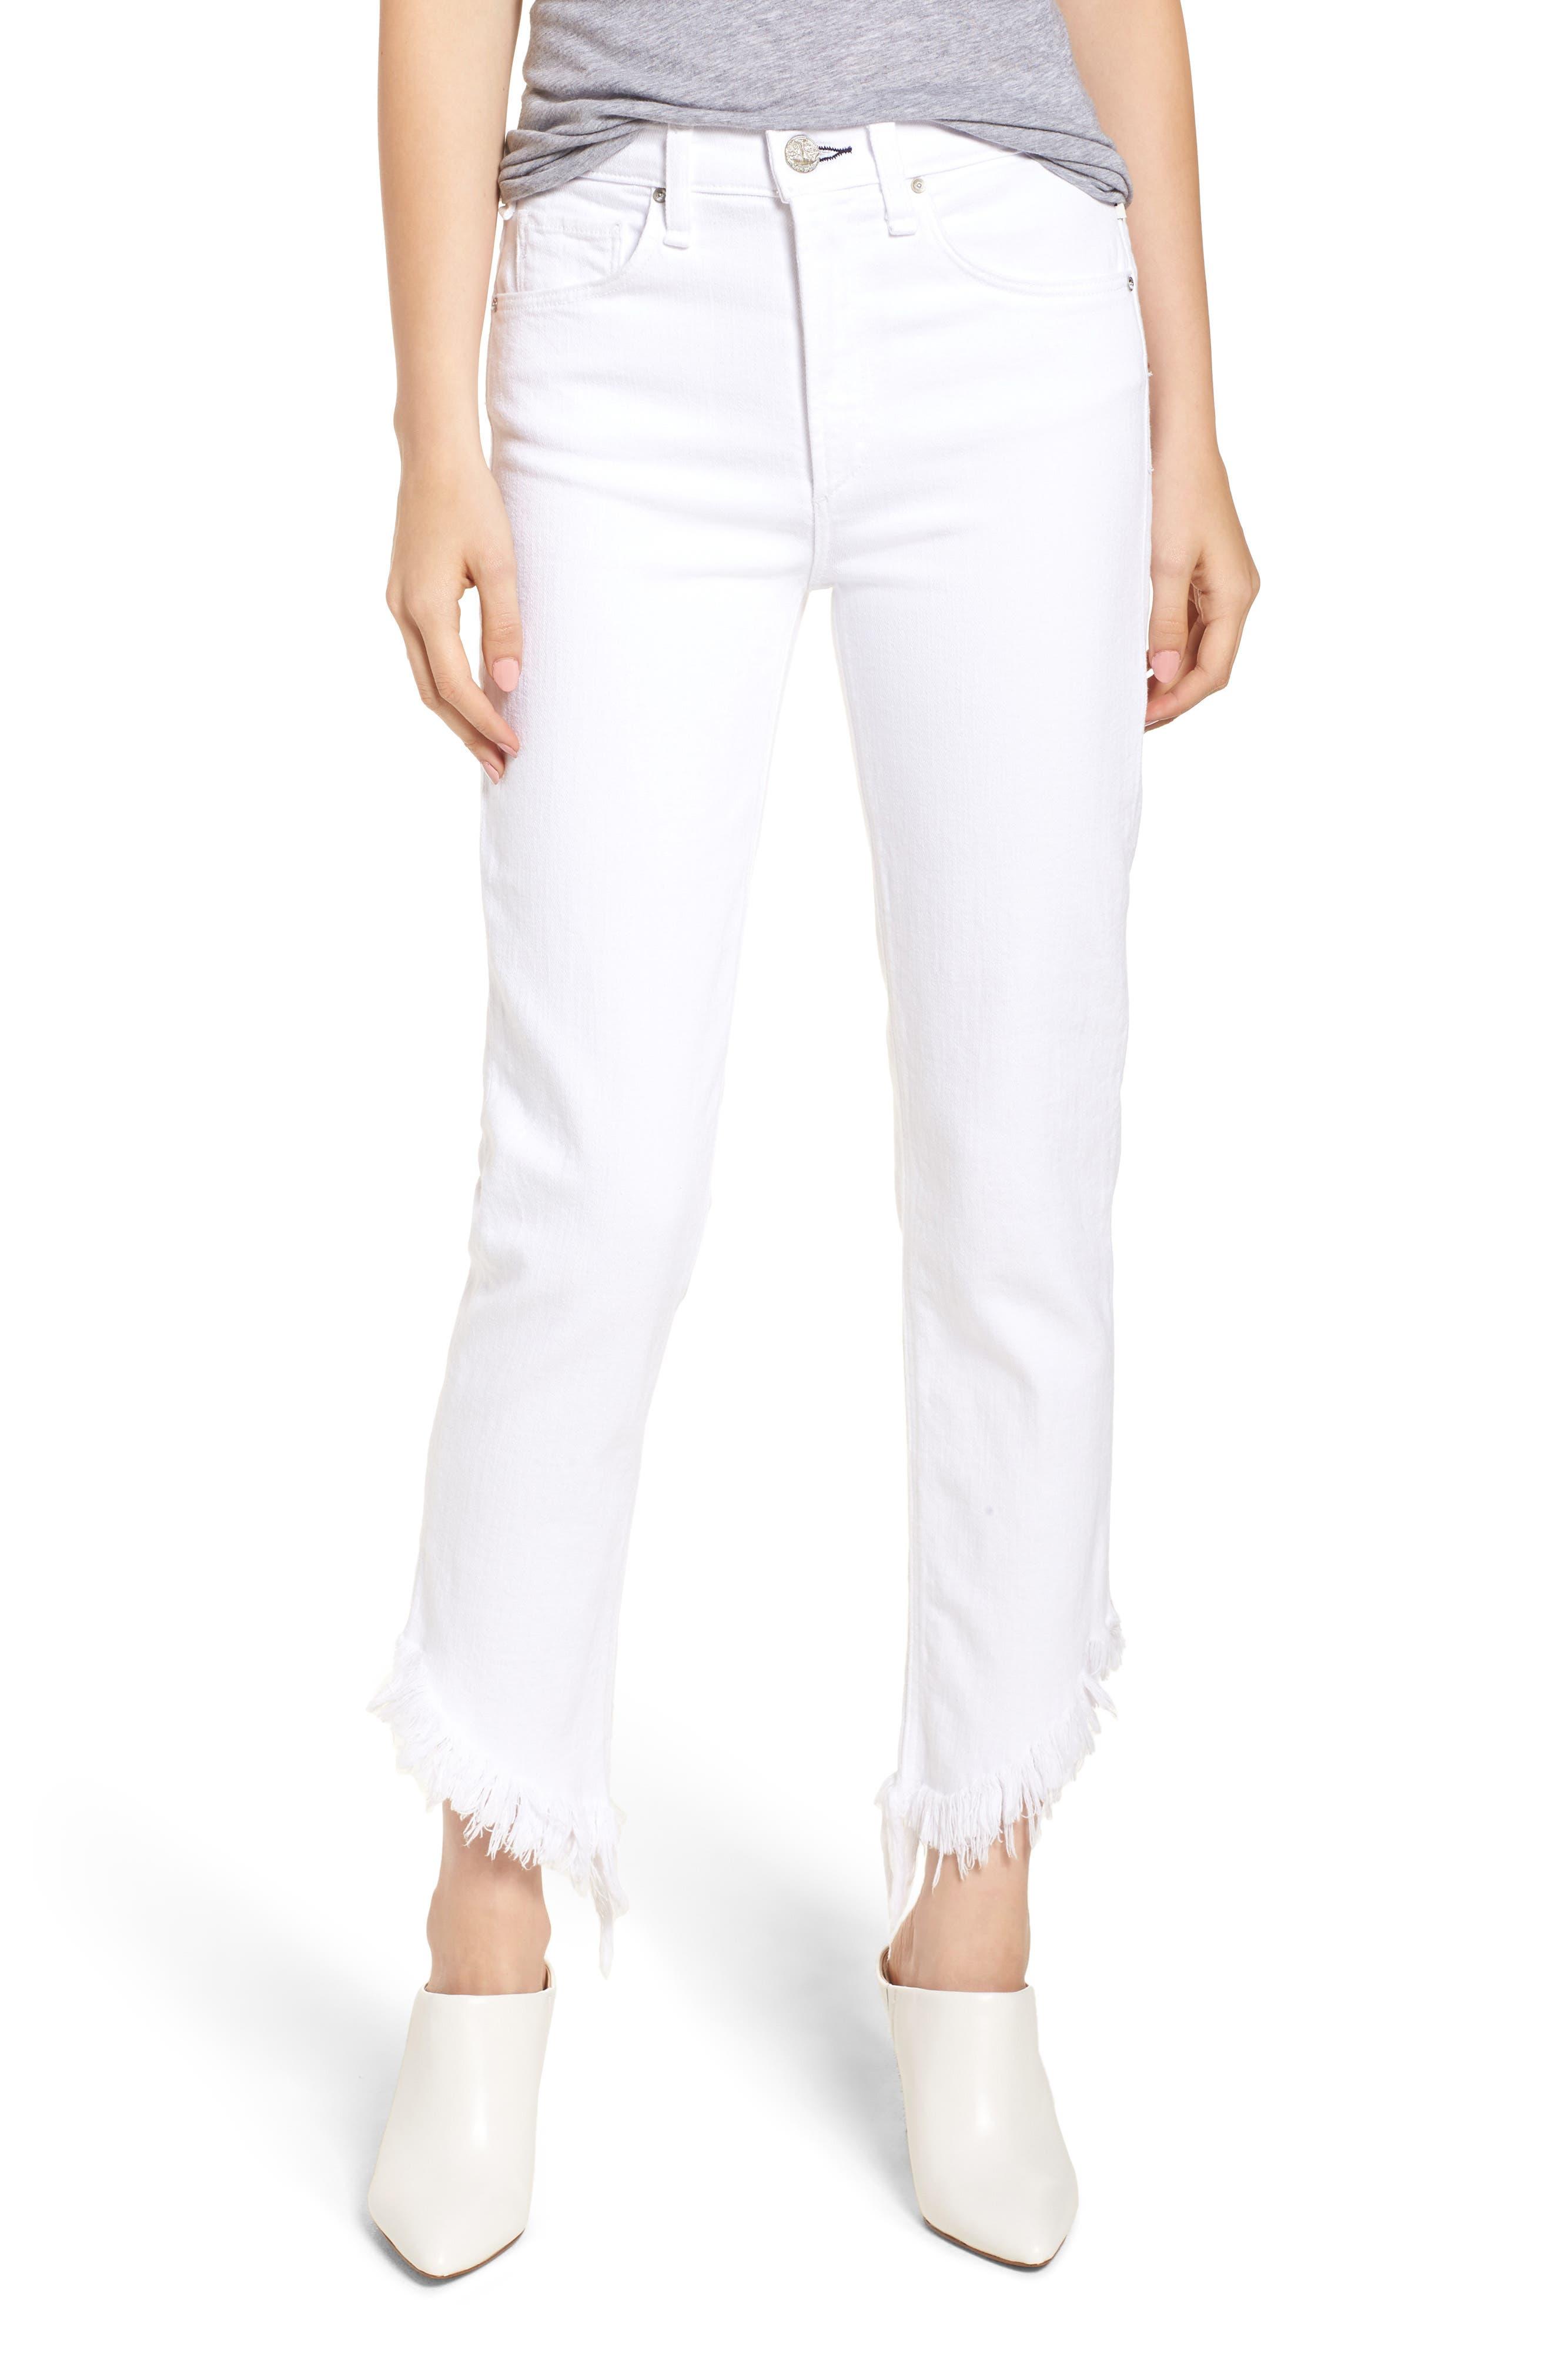 Valletta High Waist Crop Straight Leg Jeans,                             Main thumbnail 1, color,                             100